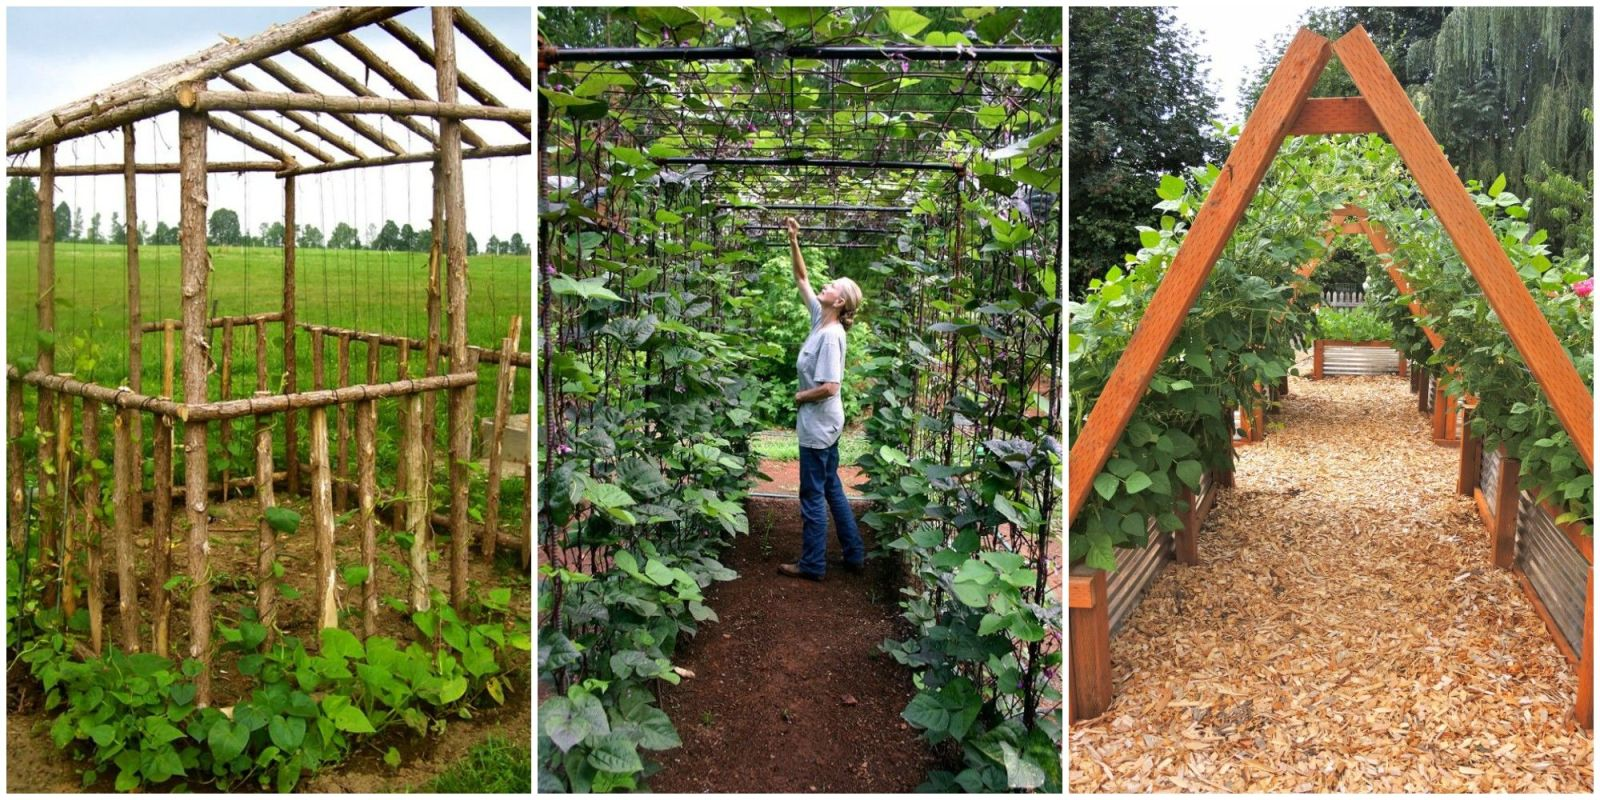 Garden Ideas Small Landscape Gardens Pictures Gallery: Upgrade Your Garden With A DIY Bean House This Spring